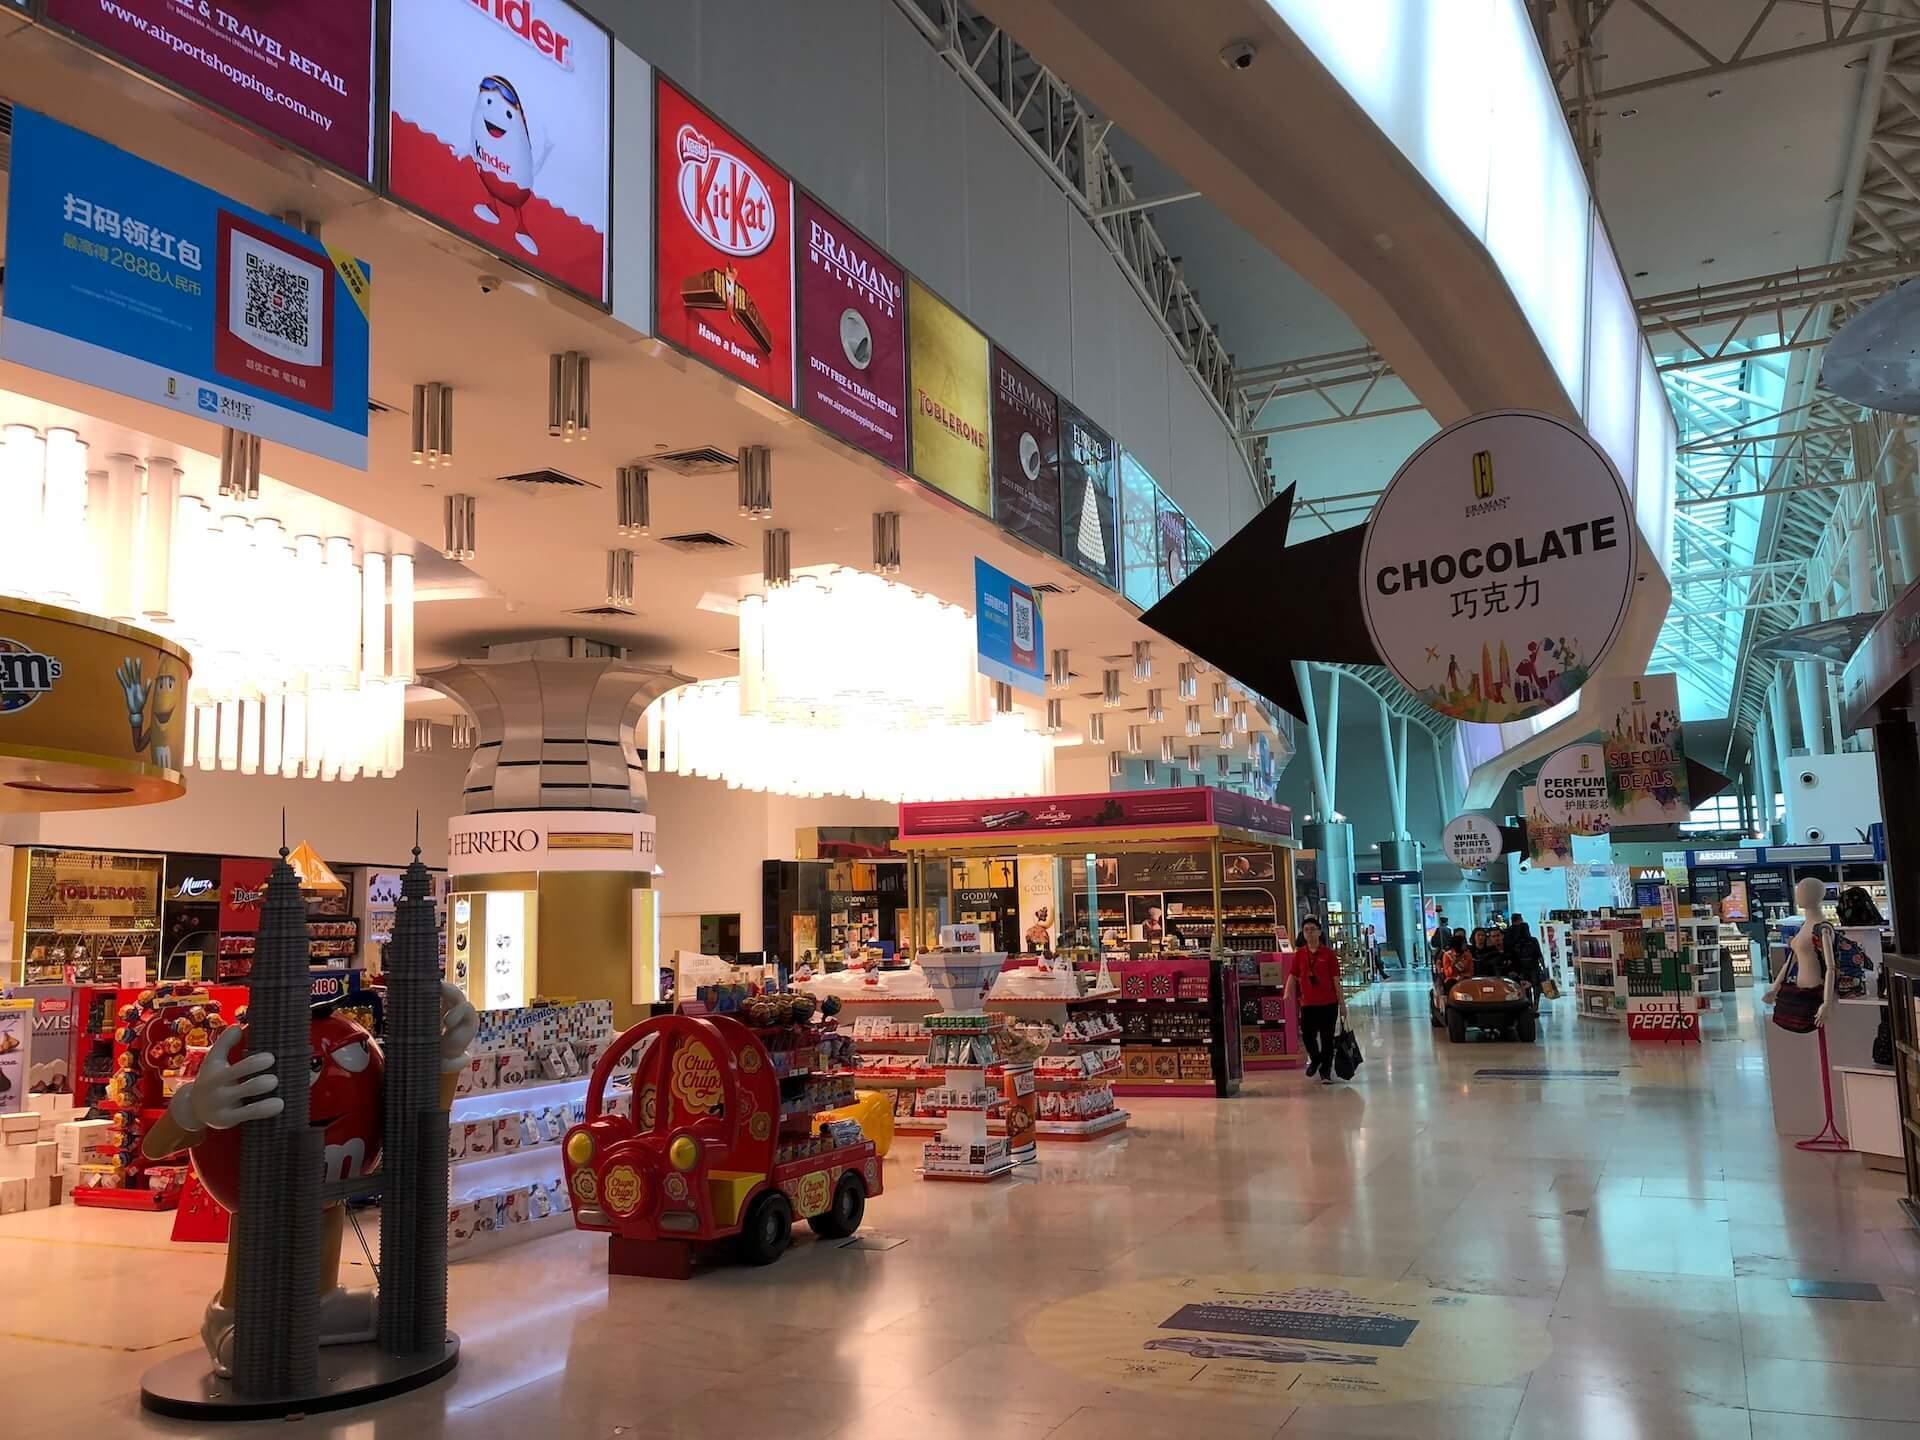 KLIA2 - Flughafen Kuala Lumpur Duty Free Shops